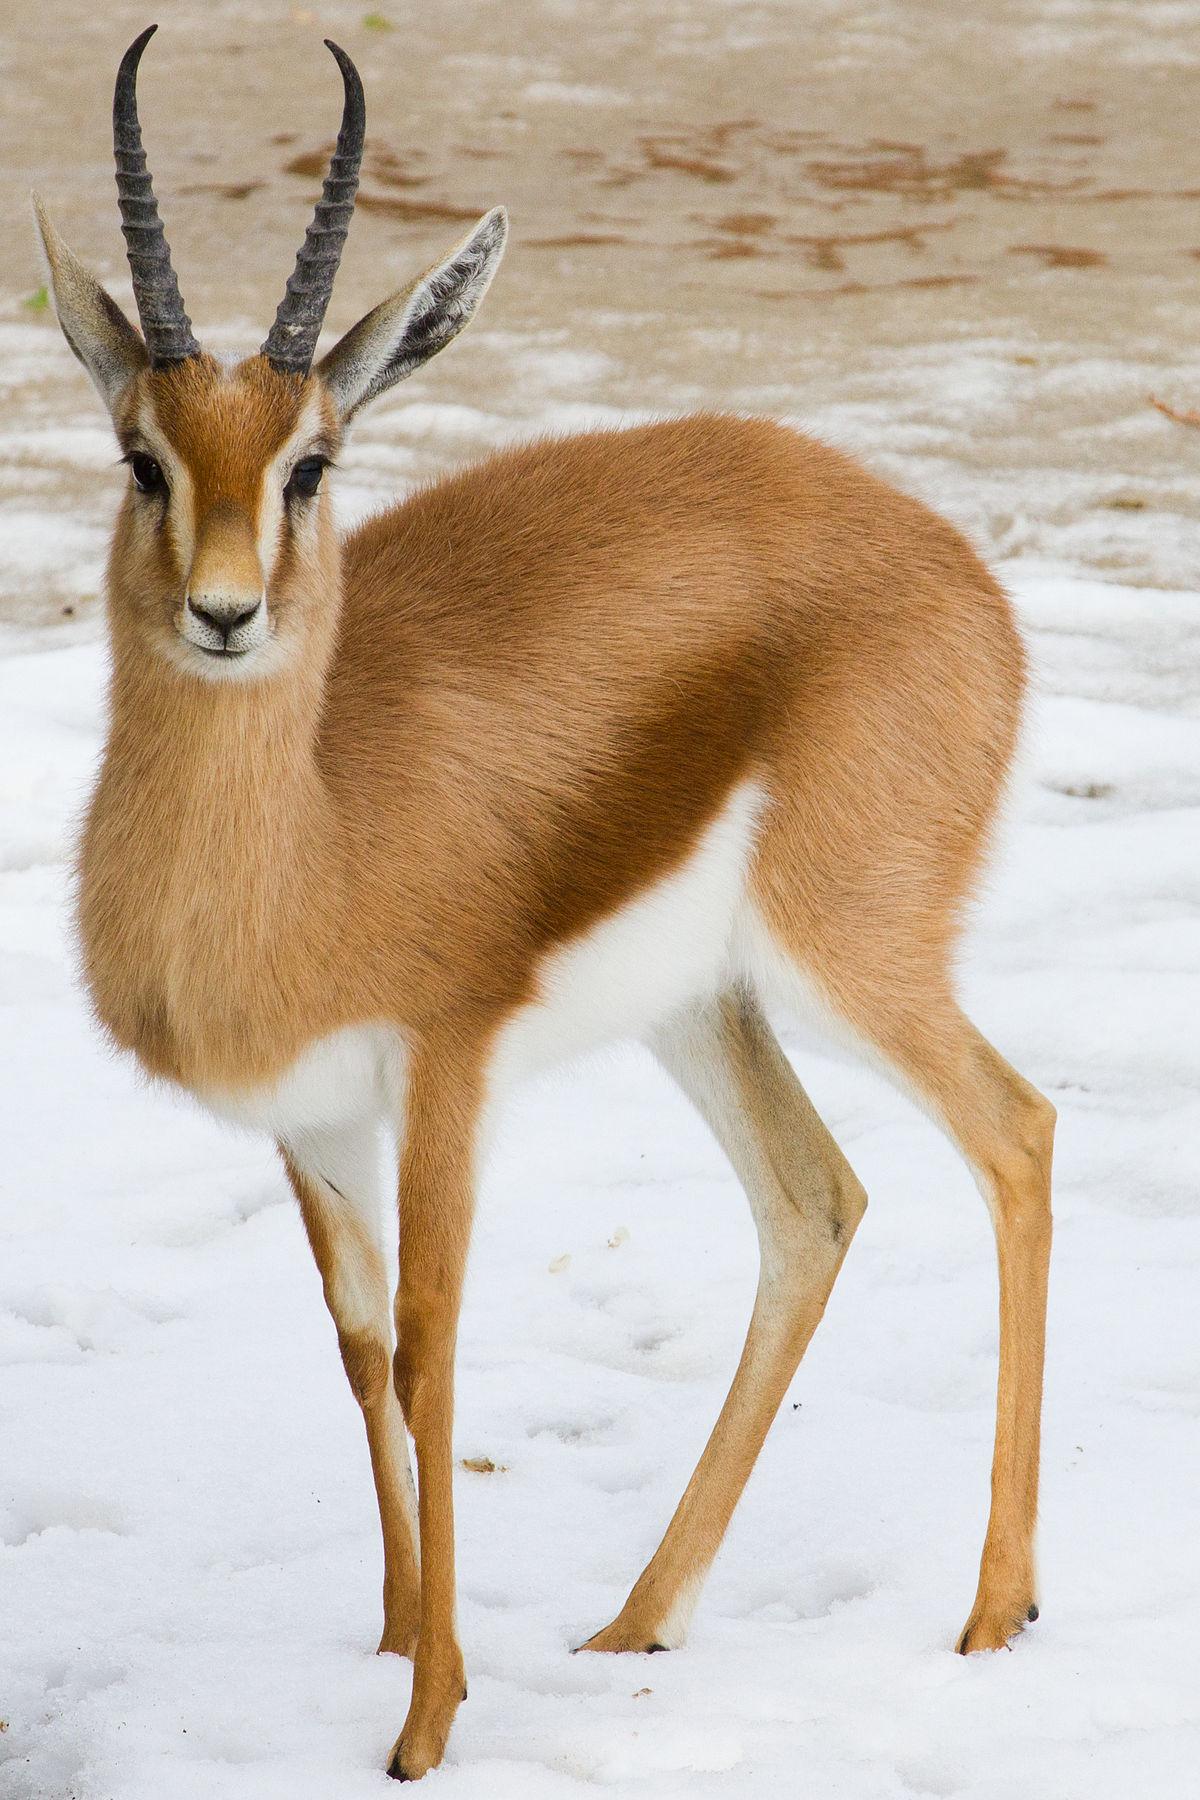 Dorcas gazelle - Wikipedia